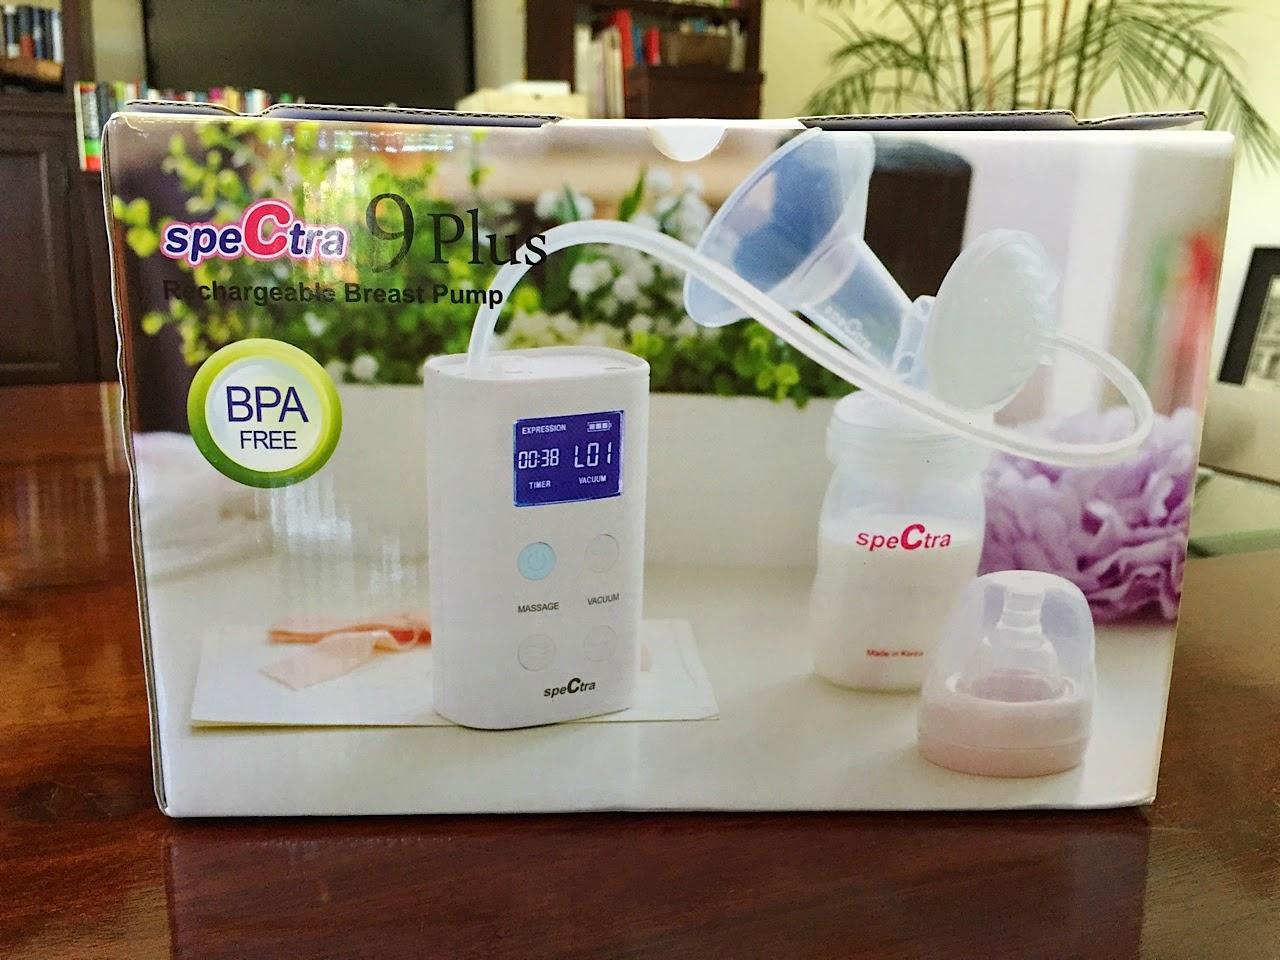 Máy hút sữa Spectra 9 Plus